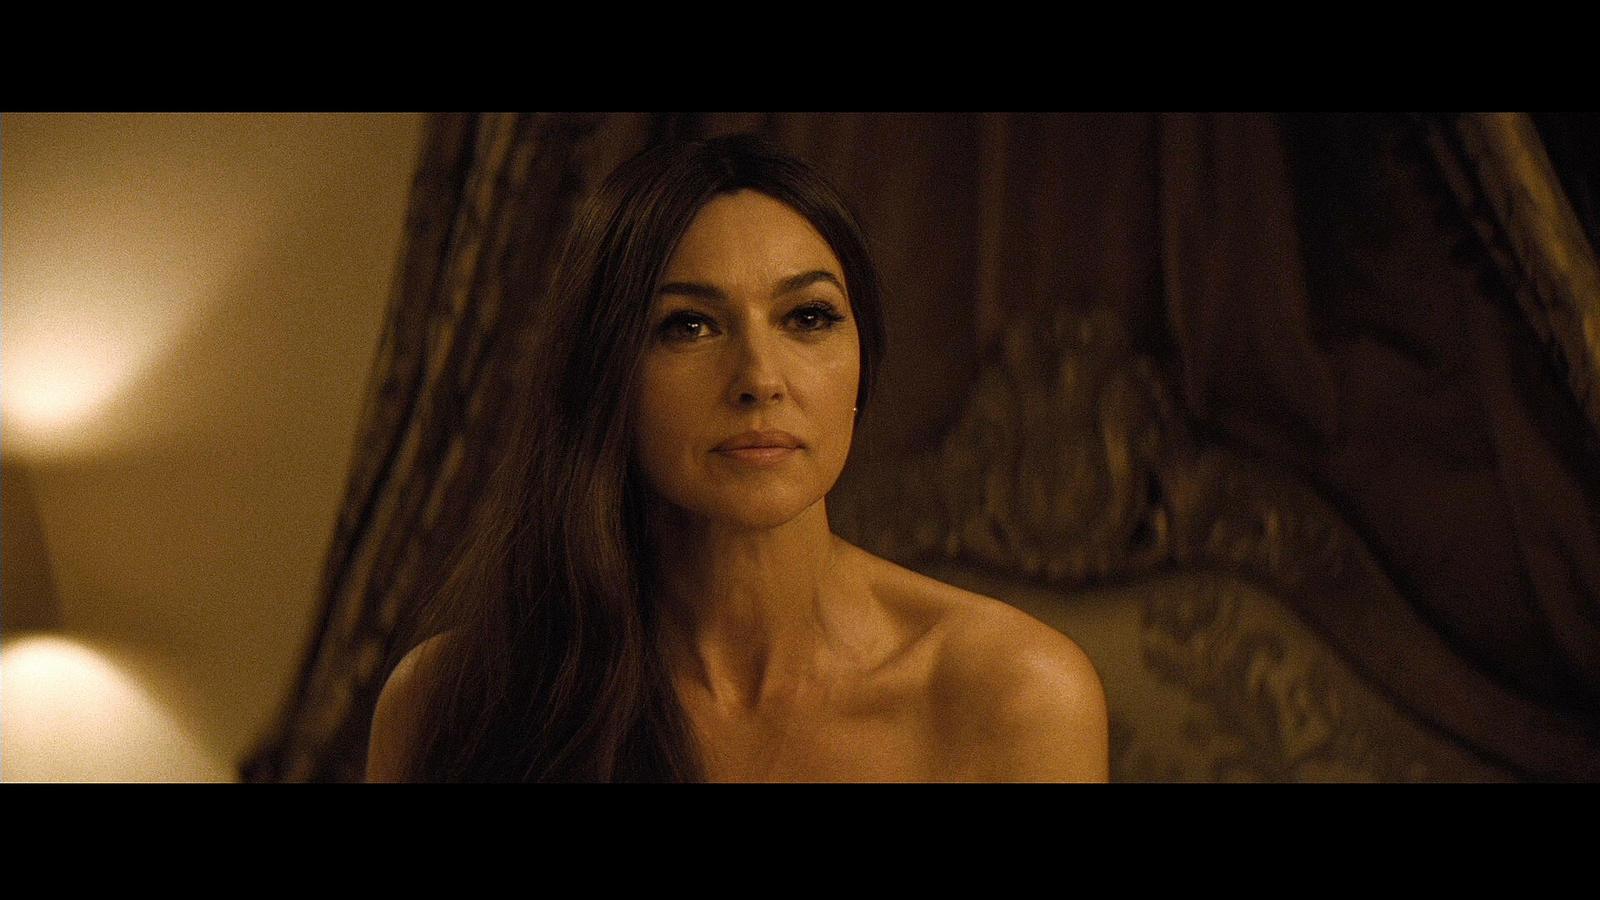 007 Spectre - Lucia Sciarra (2) by NewYungGun on DeviantArt Monica Bellucci 2018